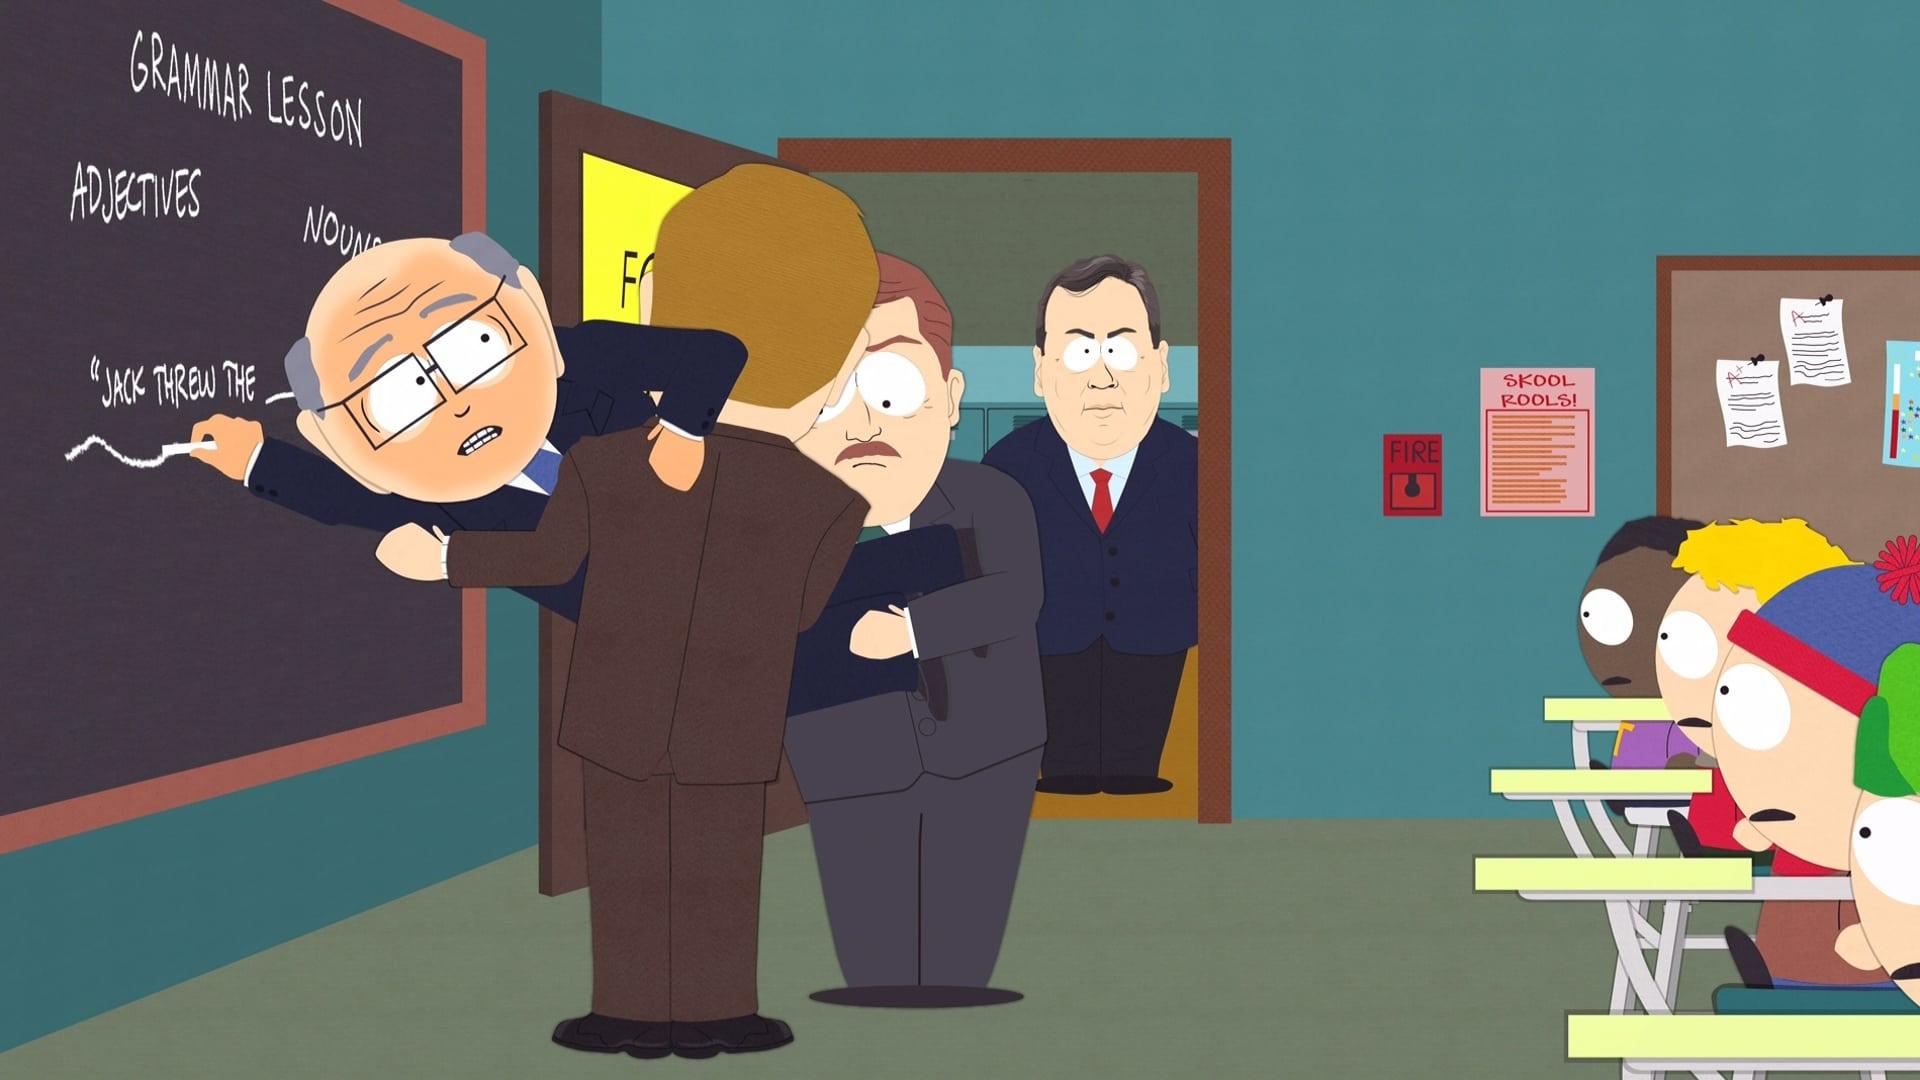 South Park - Season 20 Episode 5 : Douche and a Danish